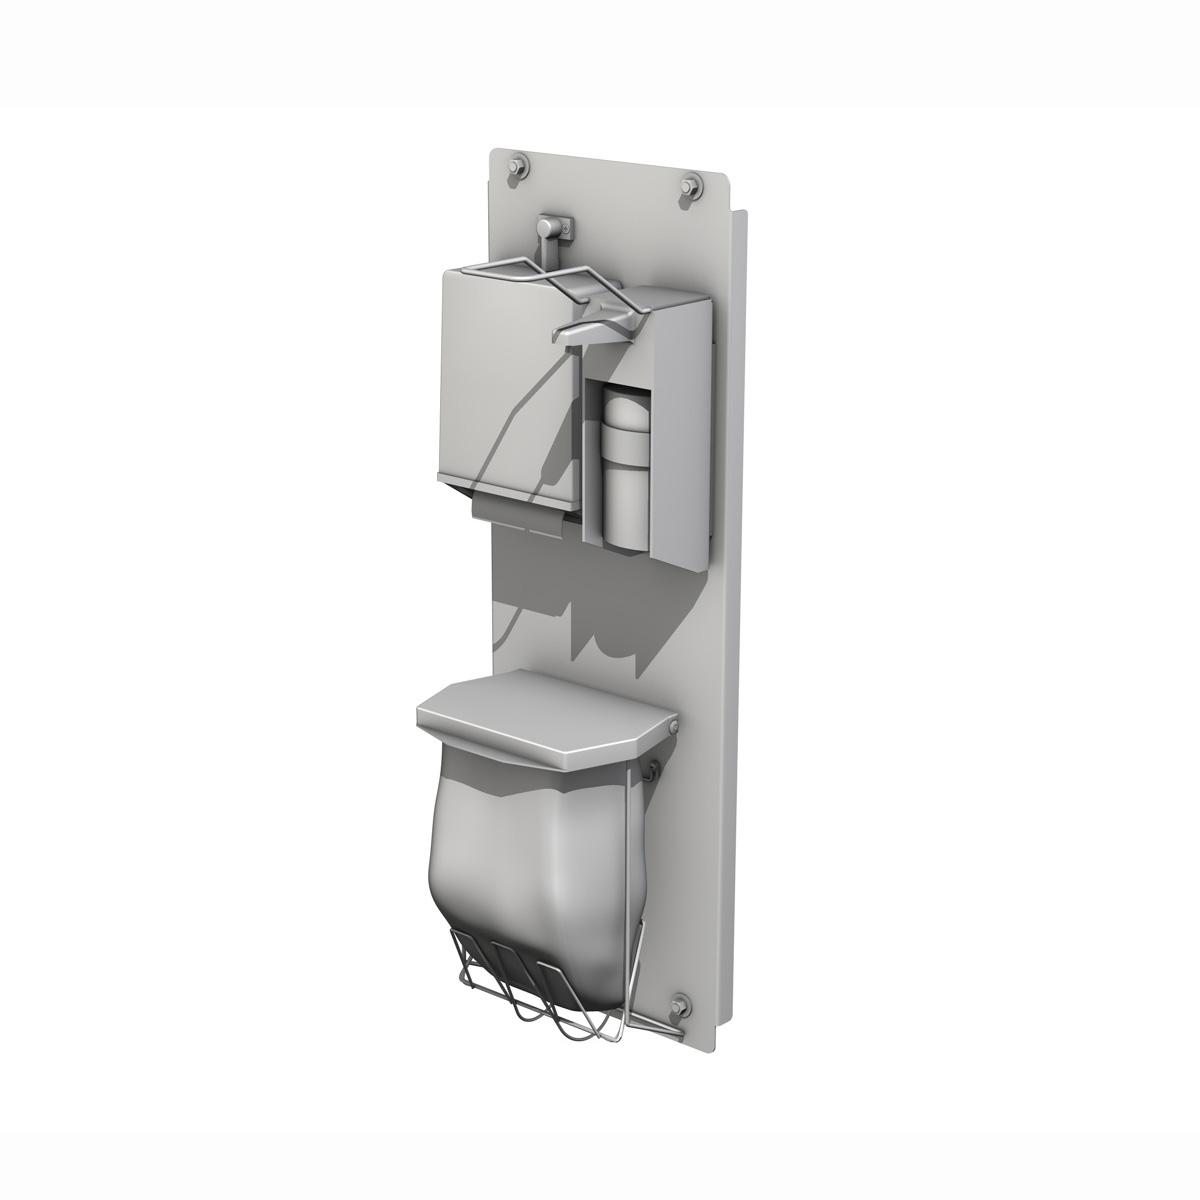 hand sanitizer station 3d model 3ds c4d lwo obj 264463